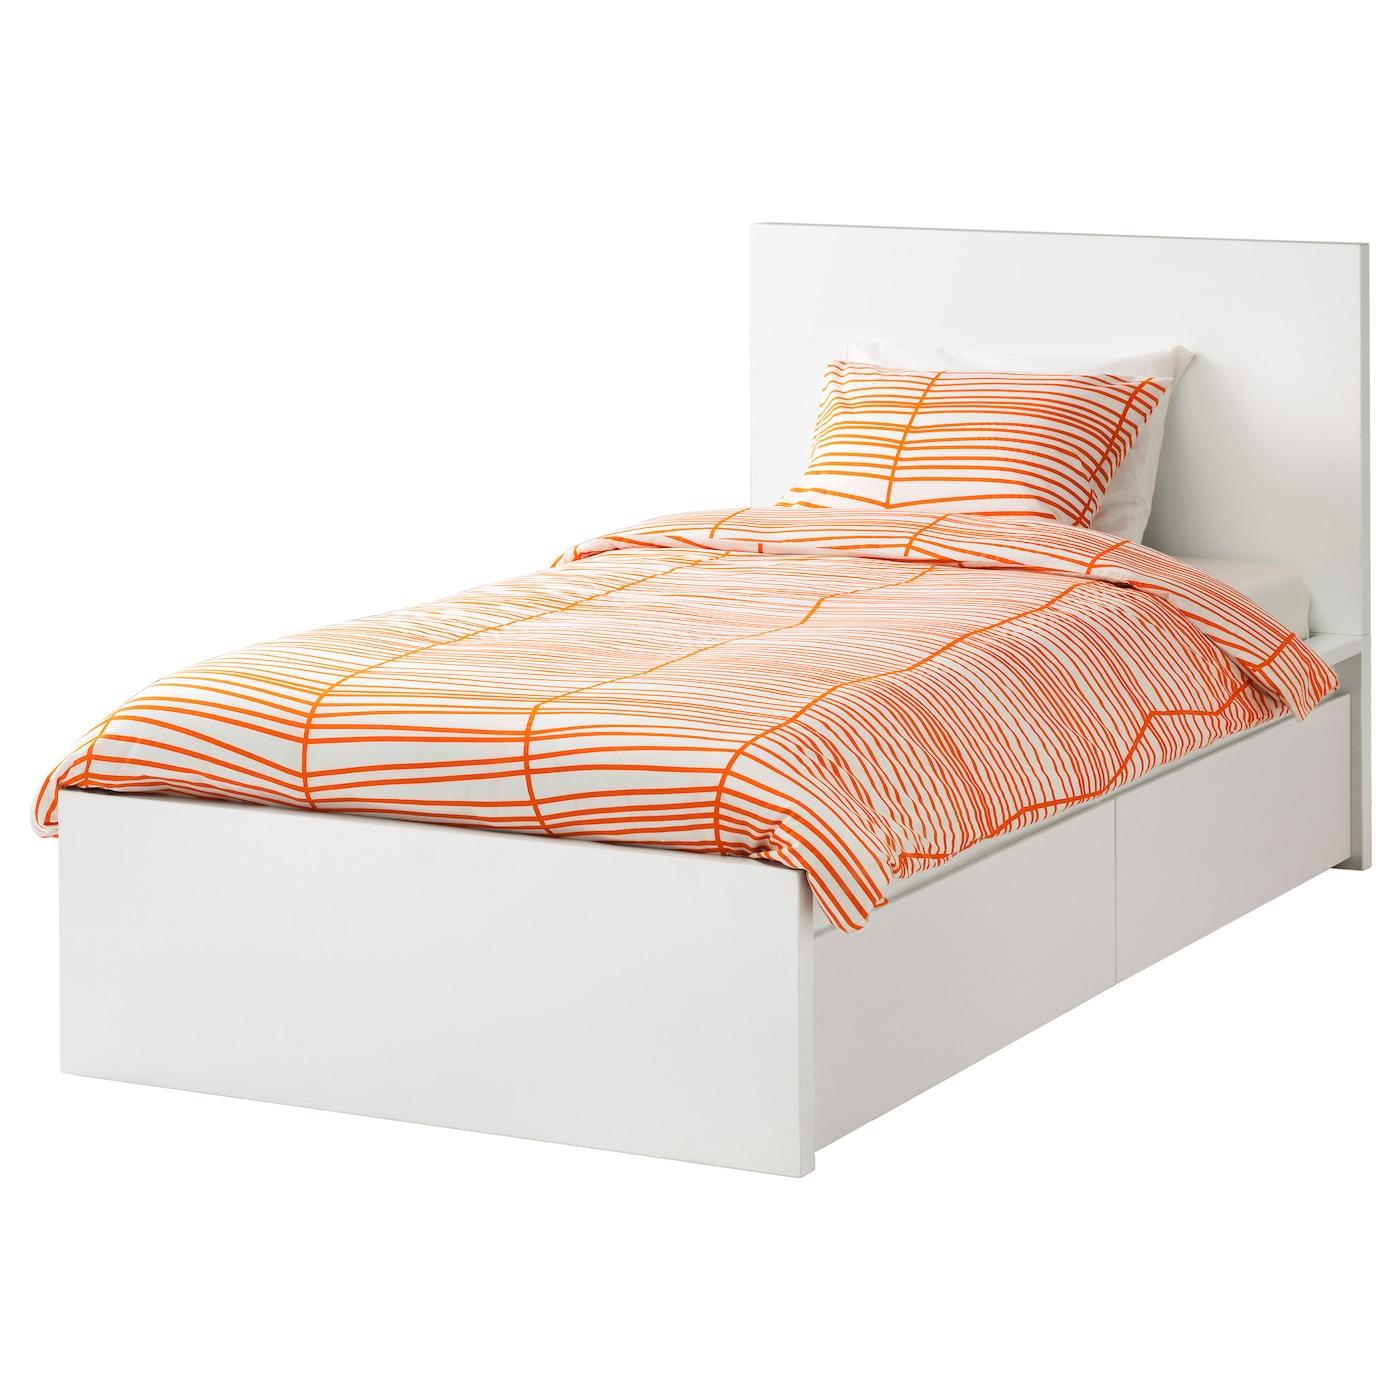 MALM Bed frame, high, w 2 storage boxes White/luröy 90 x 200 cm - IKEA